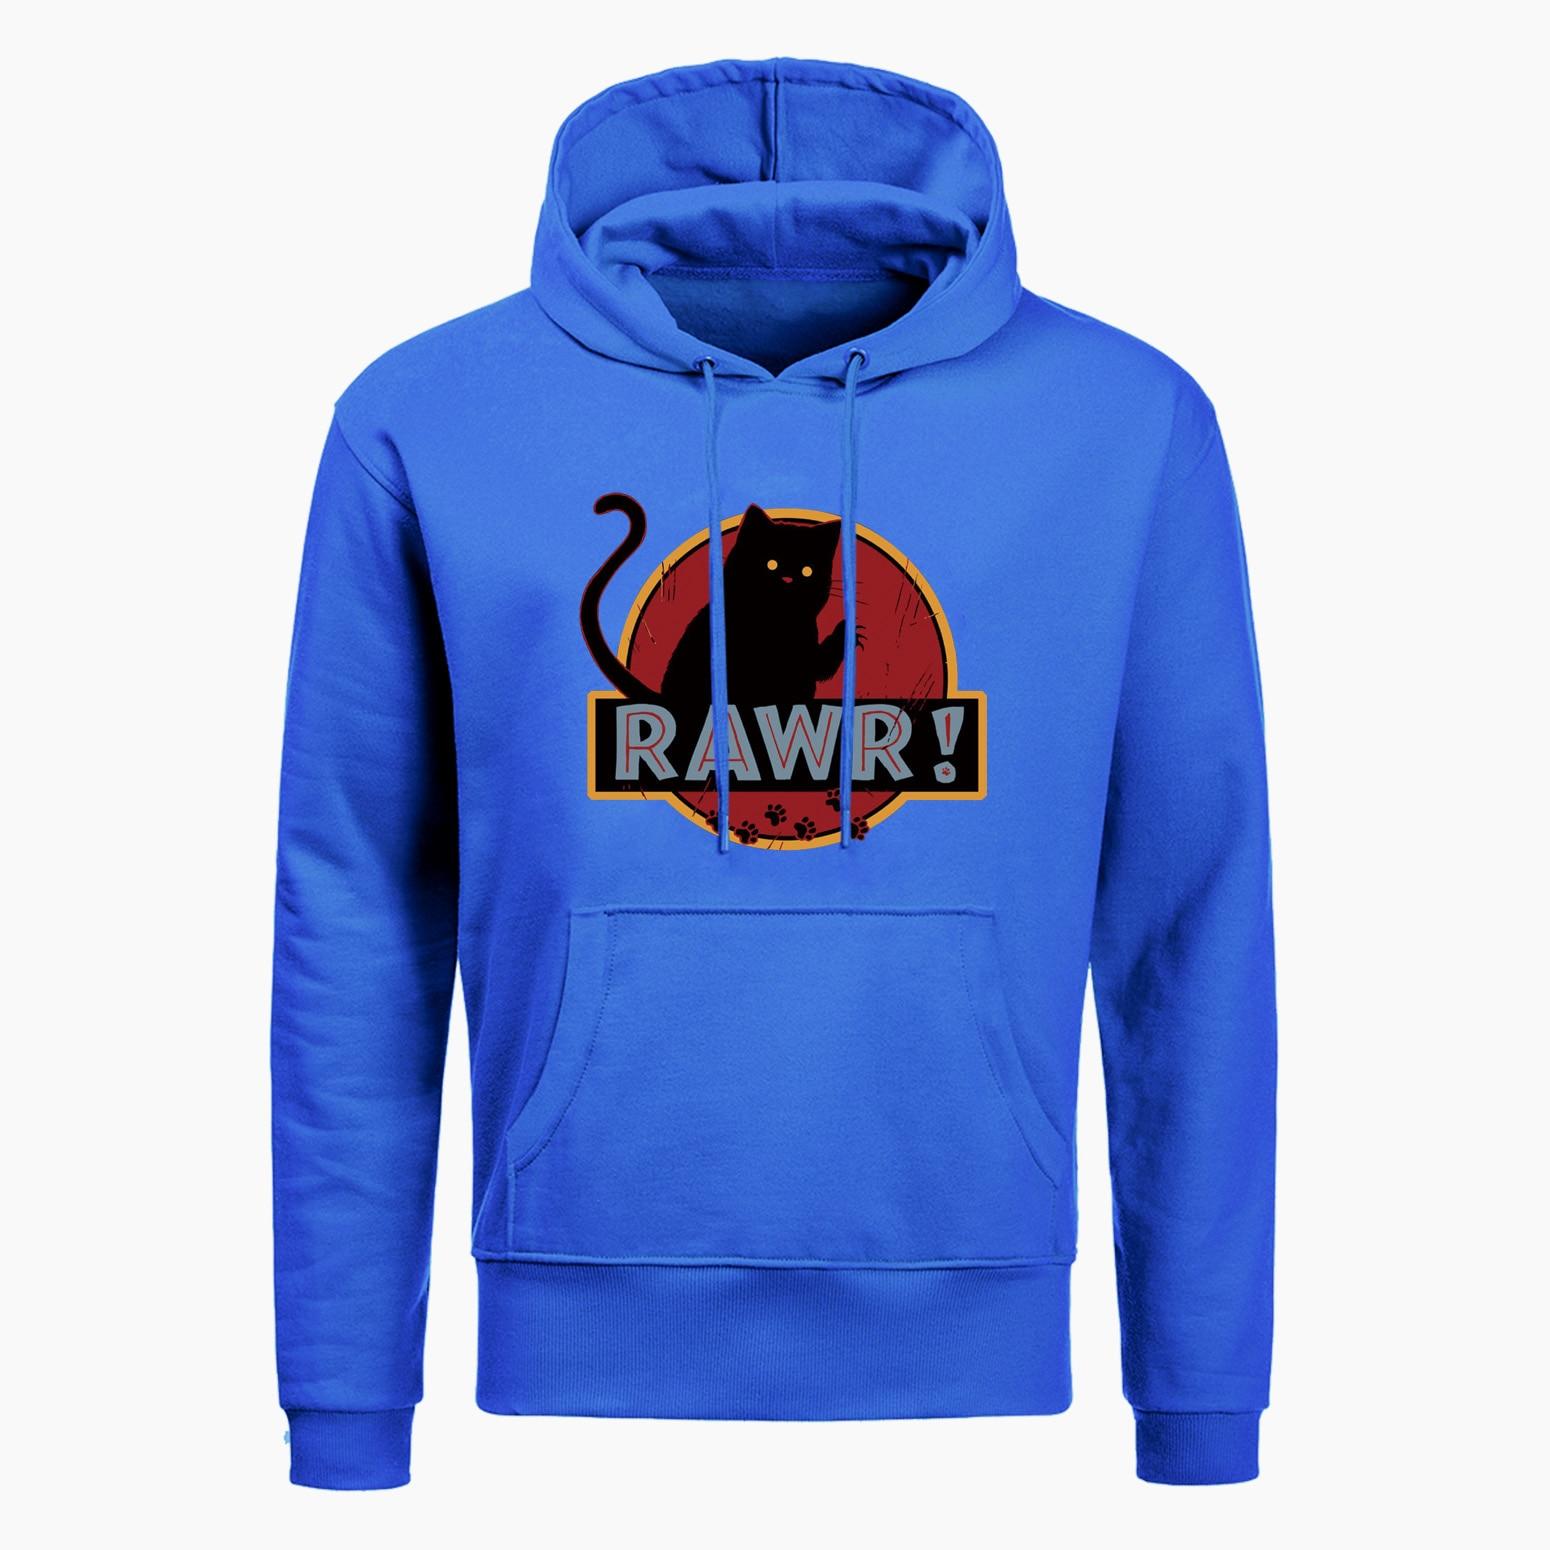 New Rawr Cat Cool Hoodies Sweatshirts Men Funny Cat Clothing 2019 Autumn Winter Fashion Casual Hip Hop Raglan Hoodie Streetwear